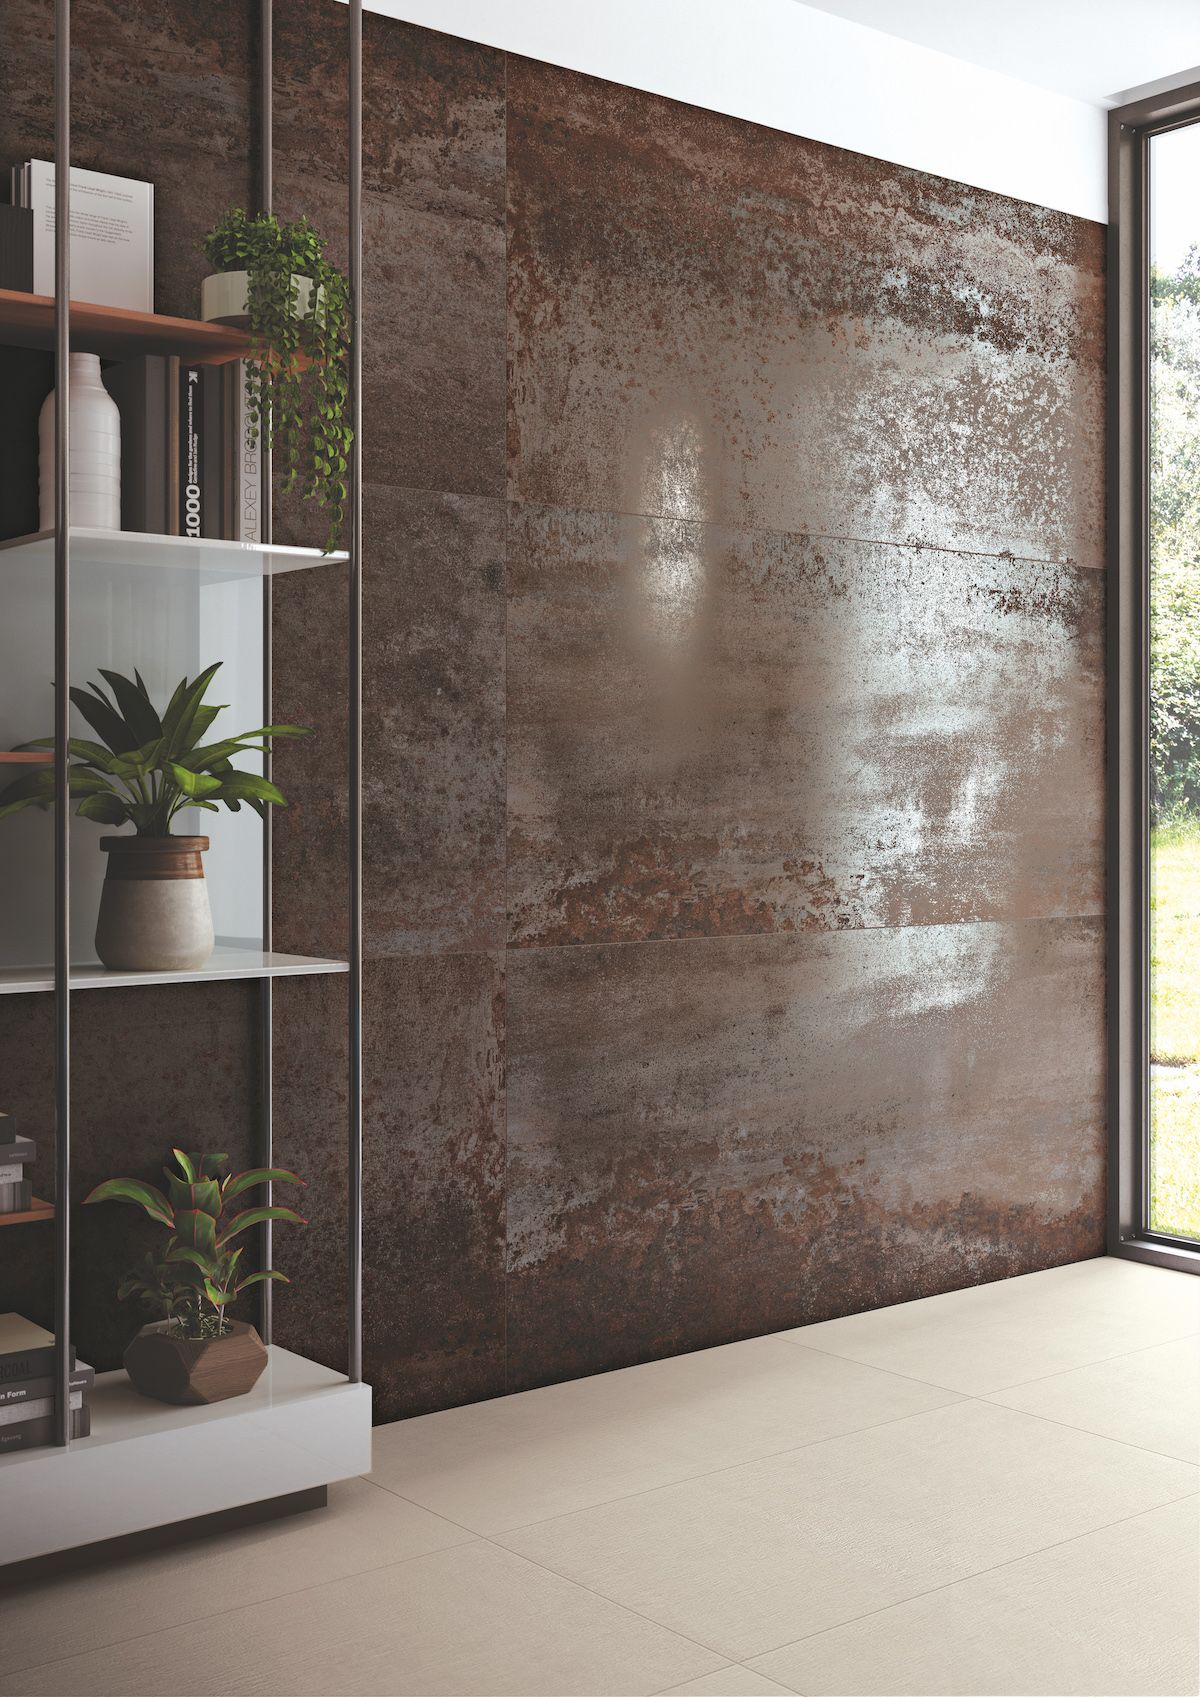 carrelage sol mur costruire metallo